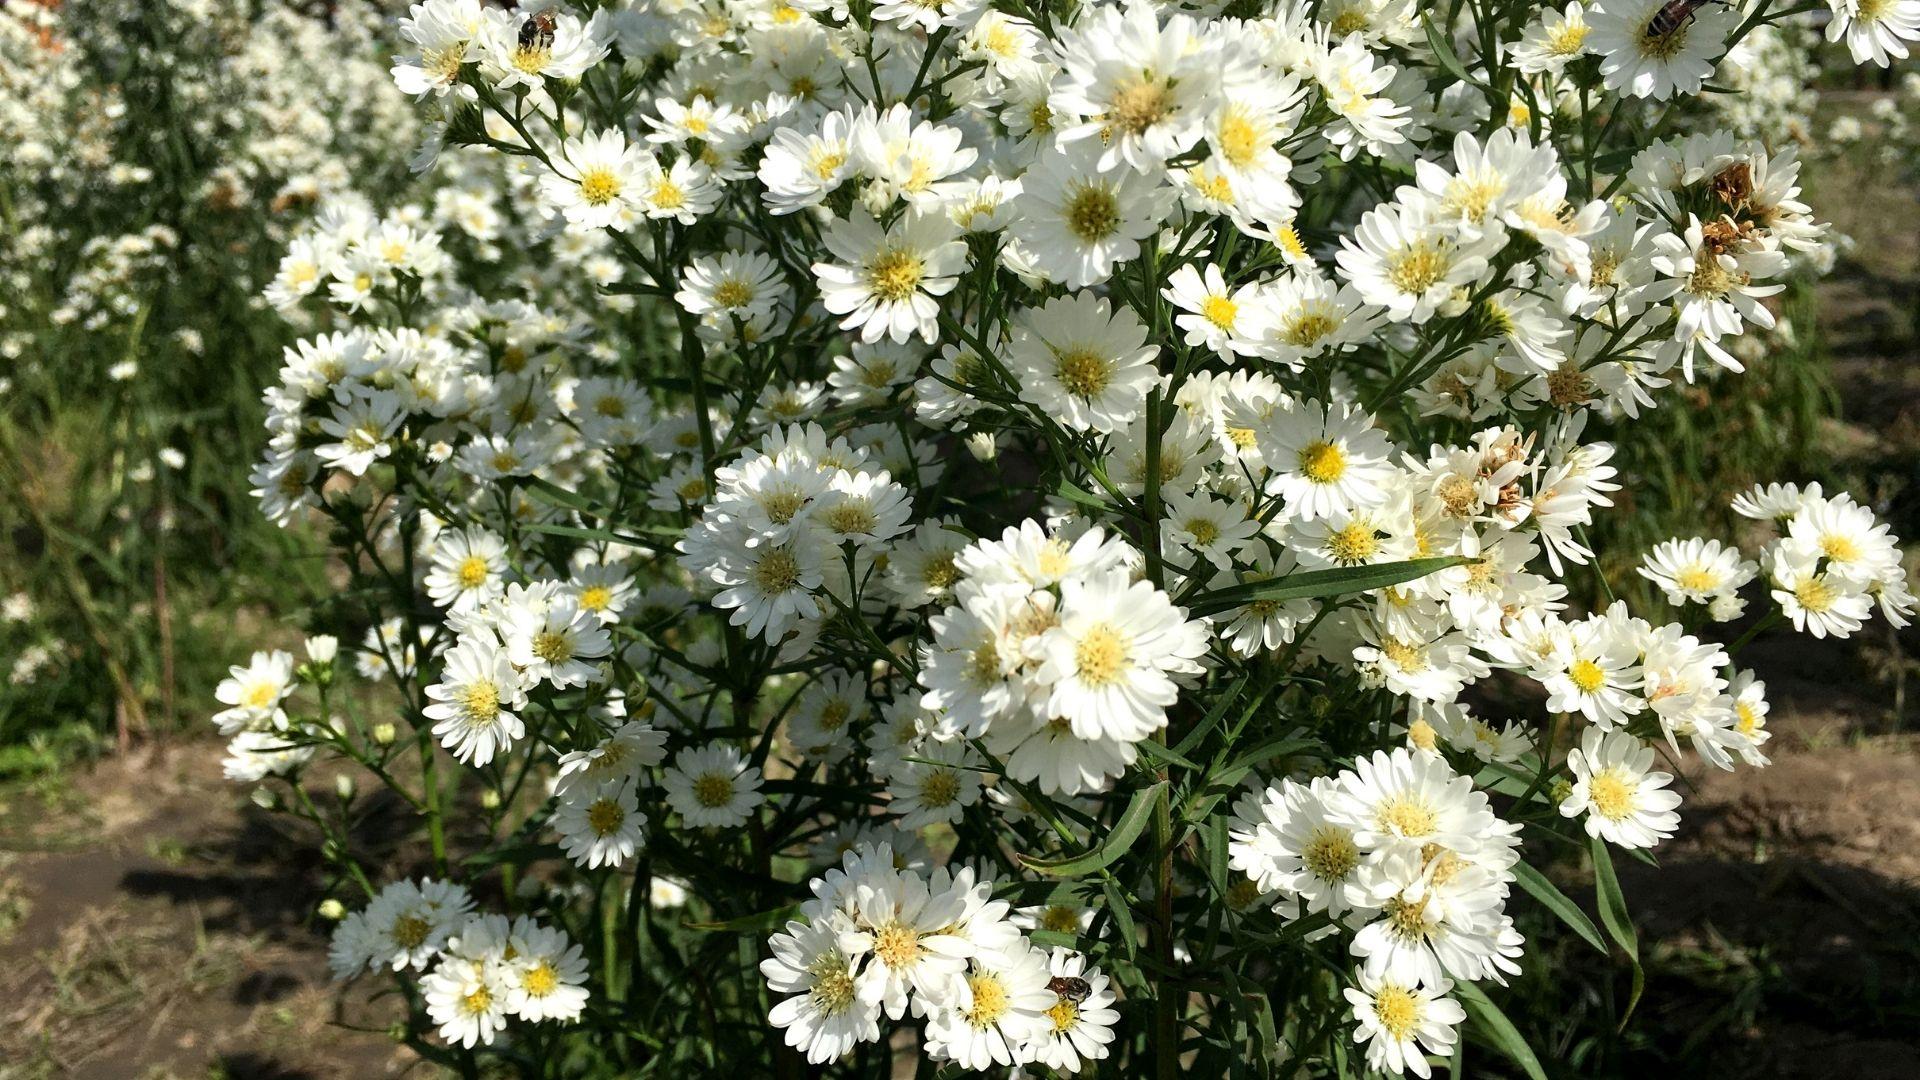 Aster ericoides - White Cutter Flower